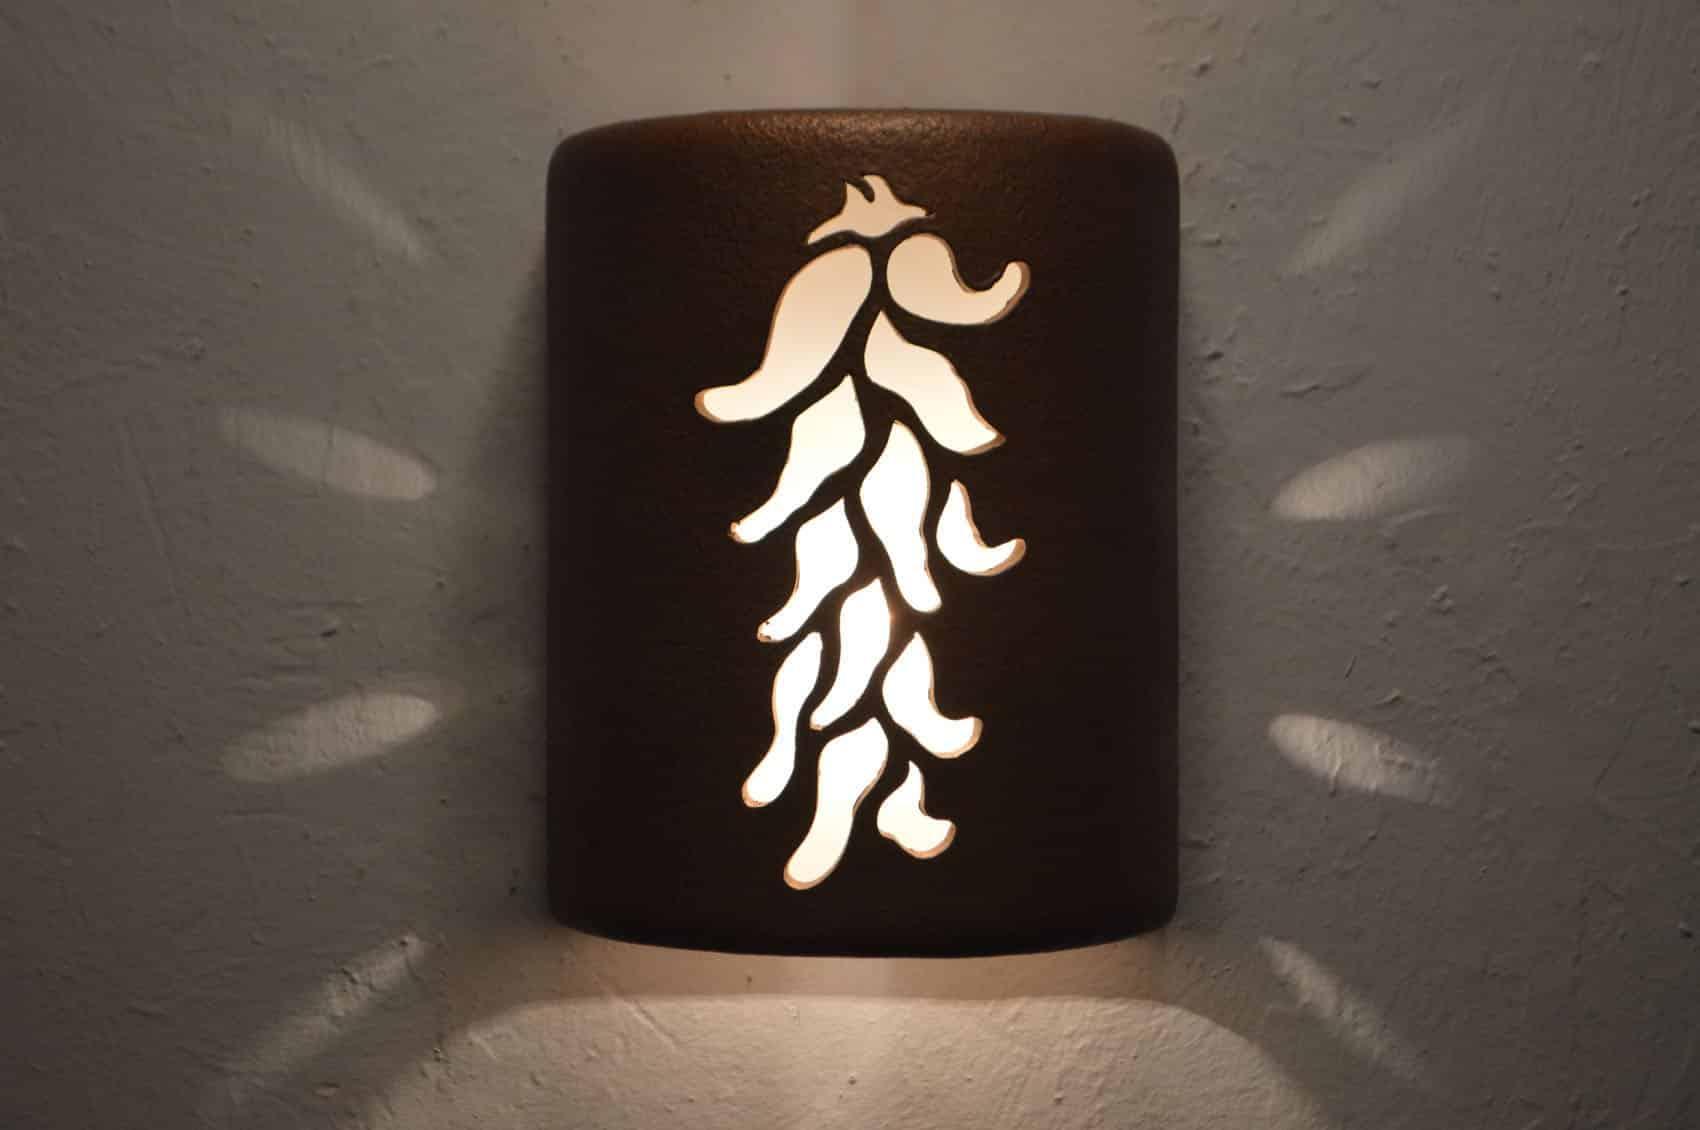 "9"" Open Top - Ristra Design, in Antique Copper Color - Indoor/Outdoor"